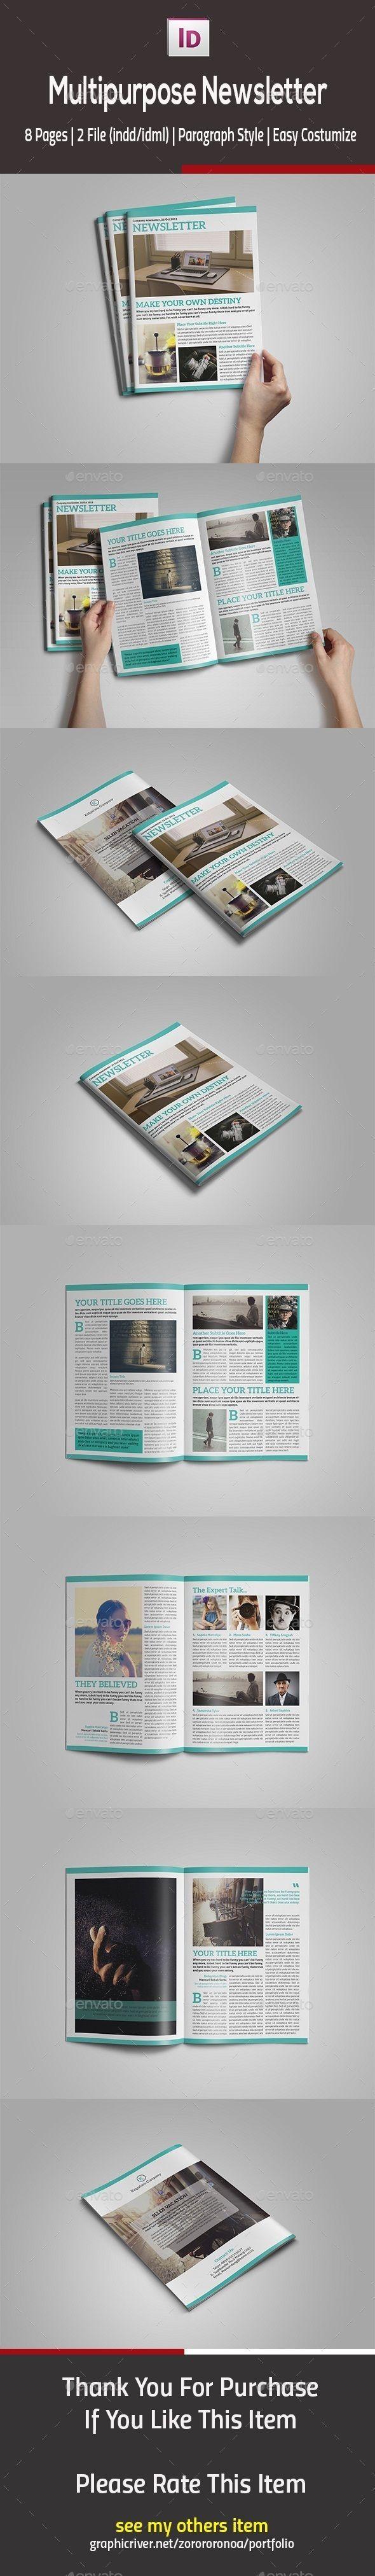 Multipurpose InDesign Newsletter Template InDesign INDD #design Download: http://graphicriver.net/item/multipurpose-indesign-newsletter/13305894?ref=ksioks